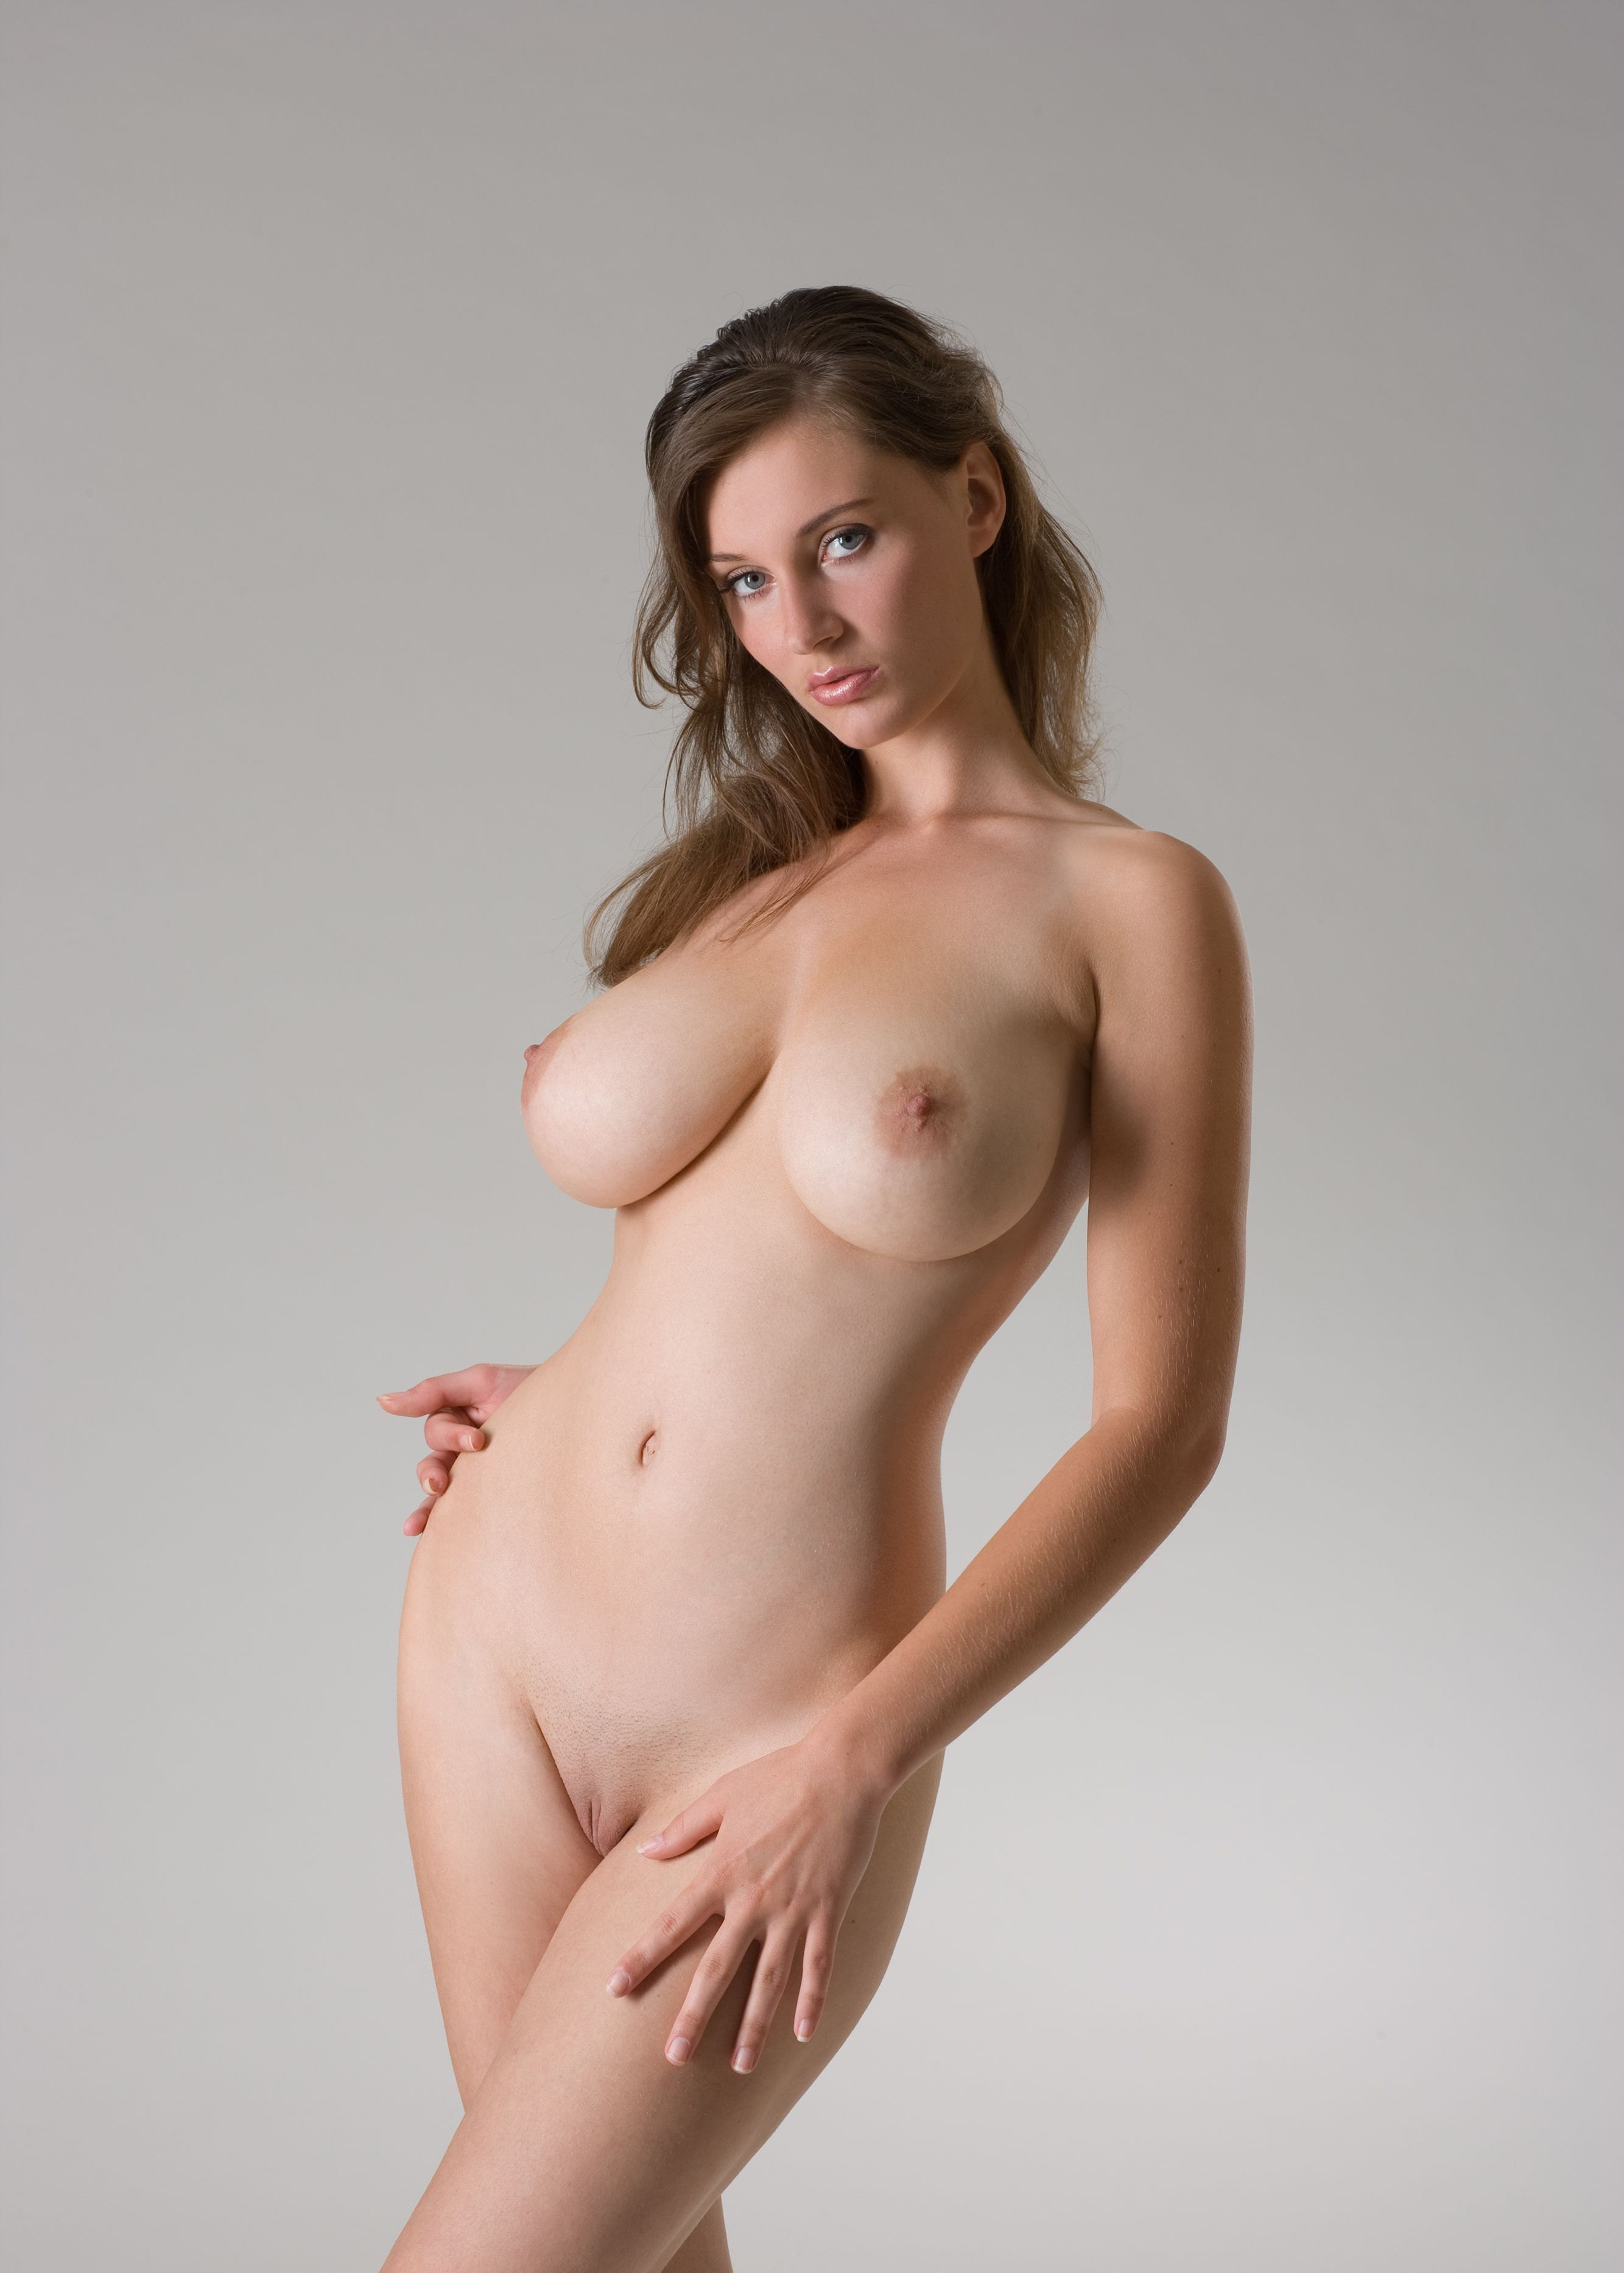 Pakistani girl anal porn